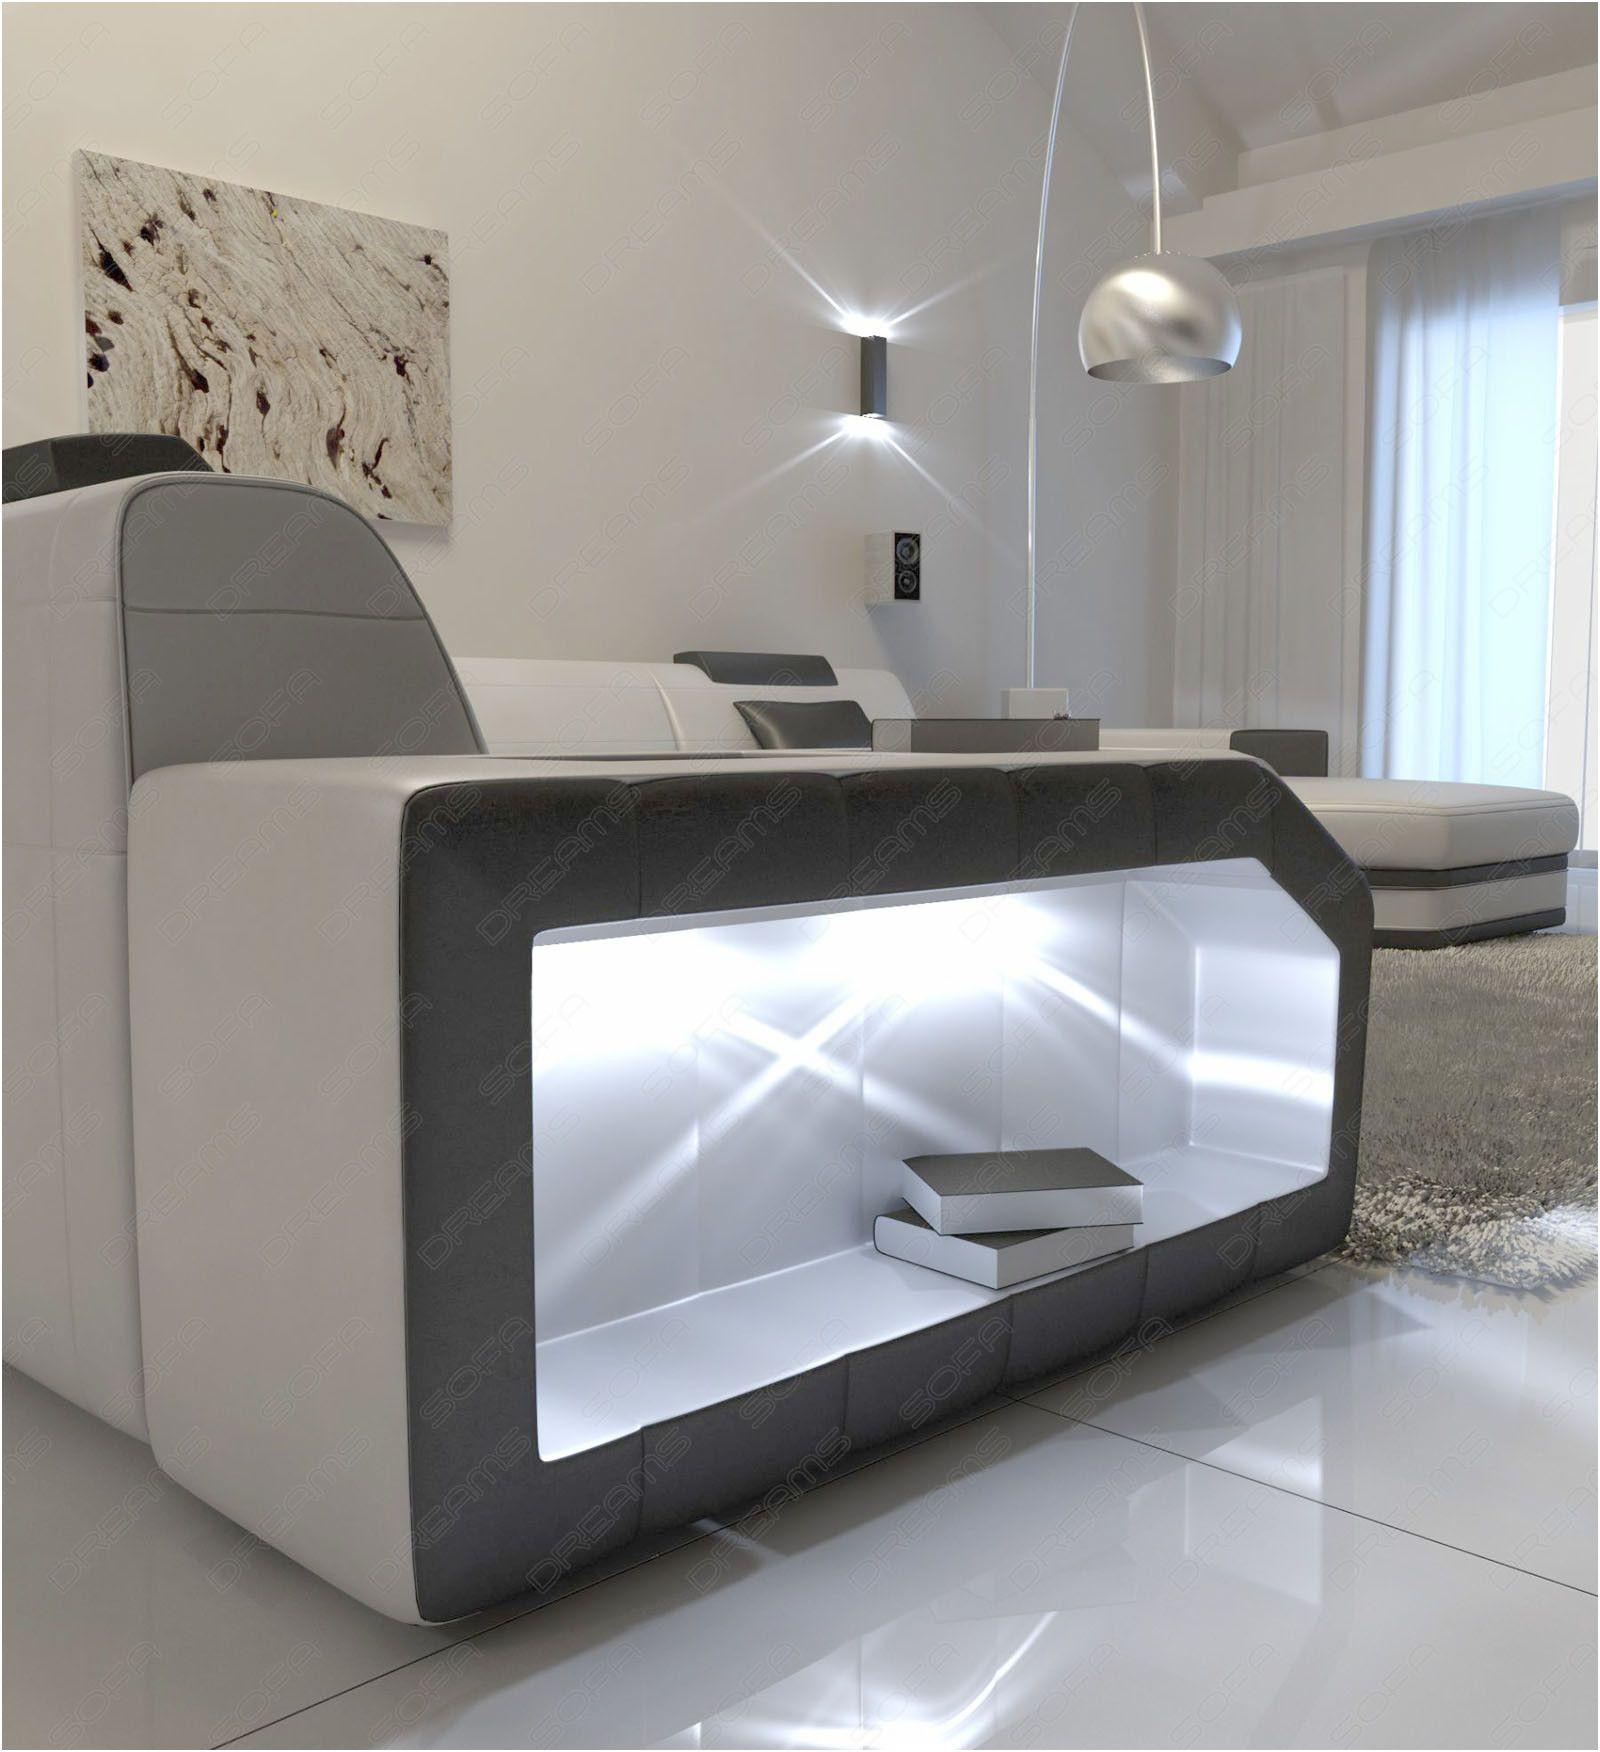 Einfach Sofa Grau Schwarz In 2020 Big Sofas Home Decor Home